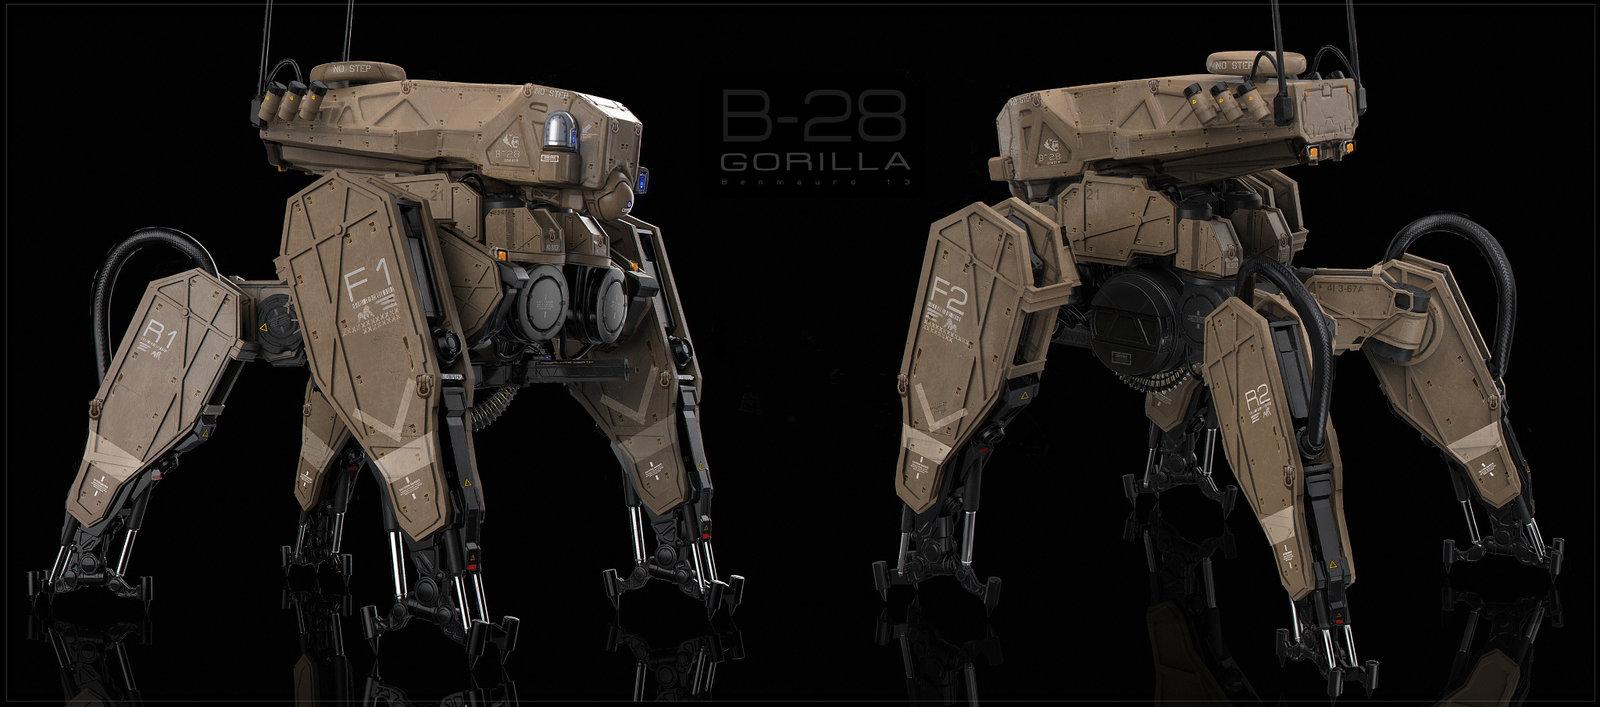 Gorilla Tank - ortho